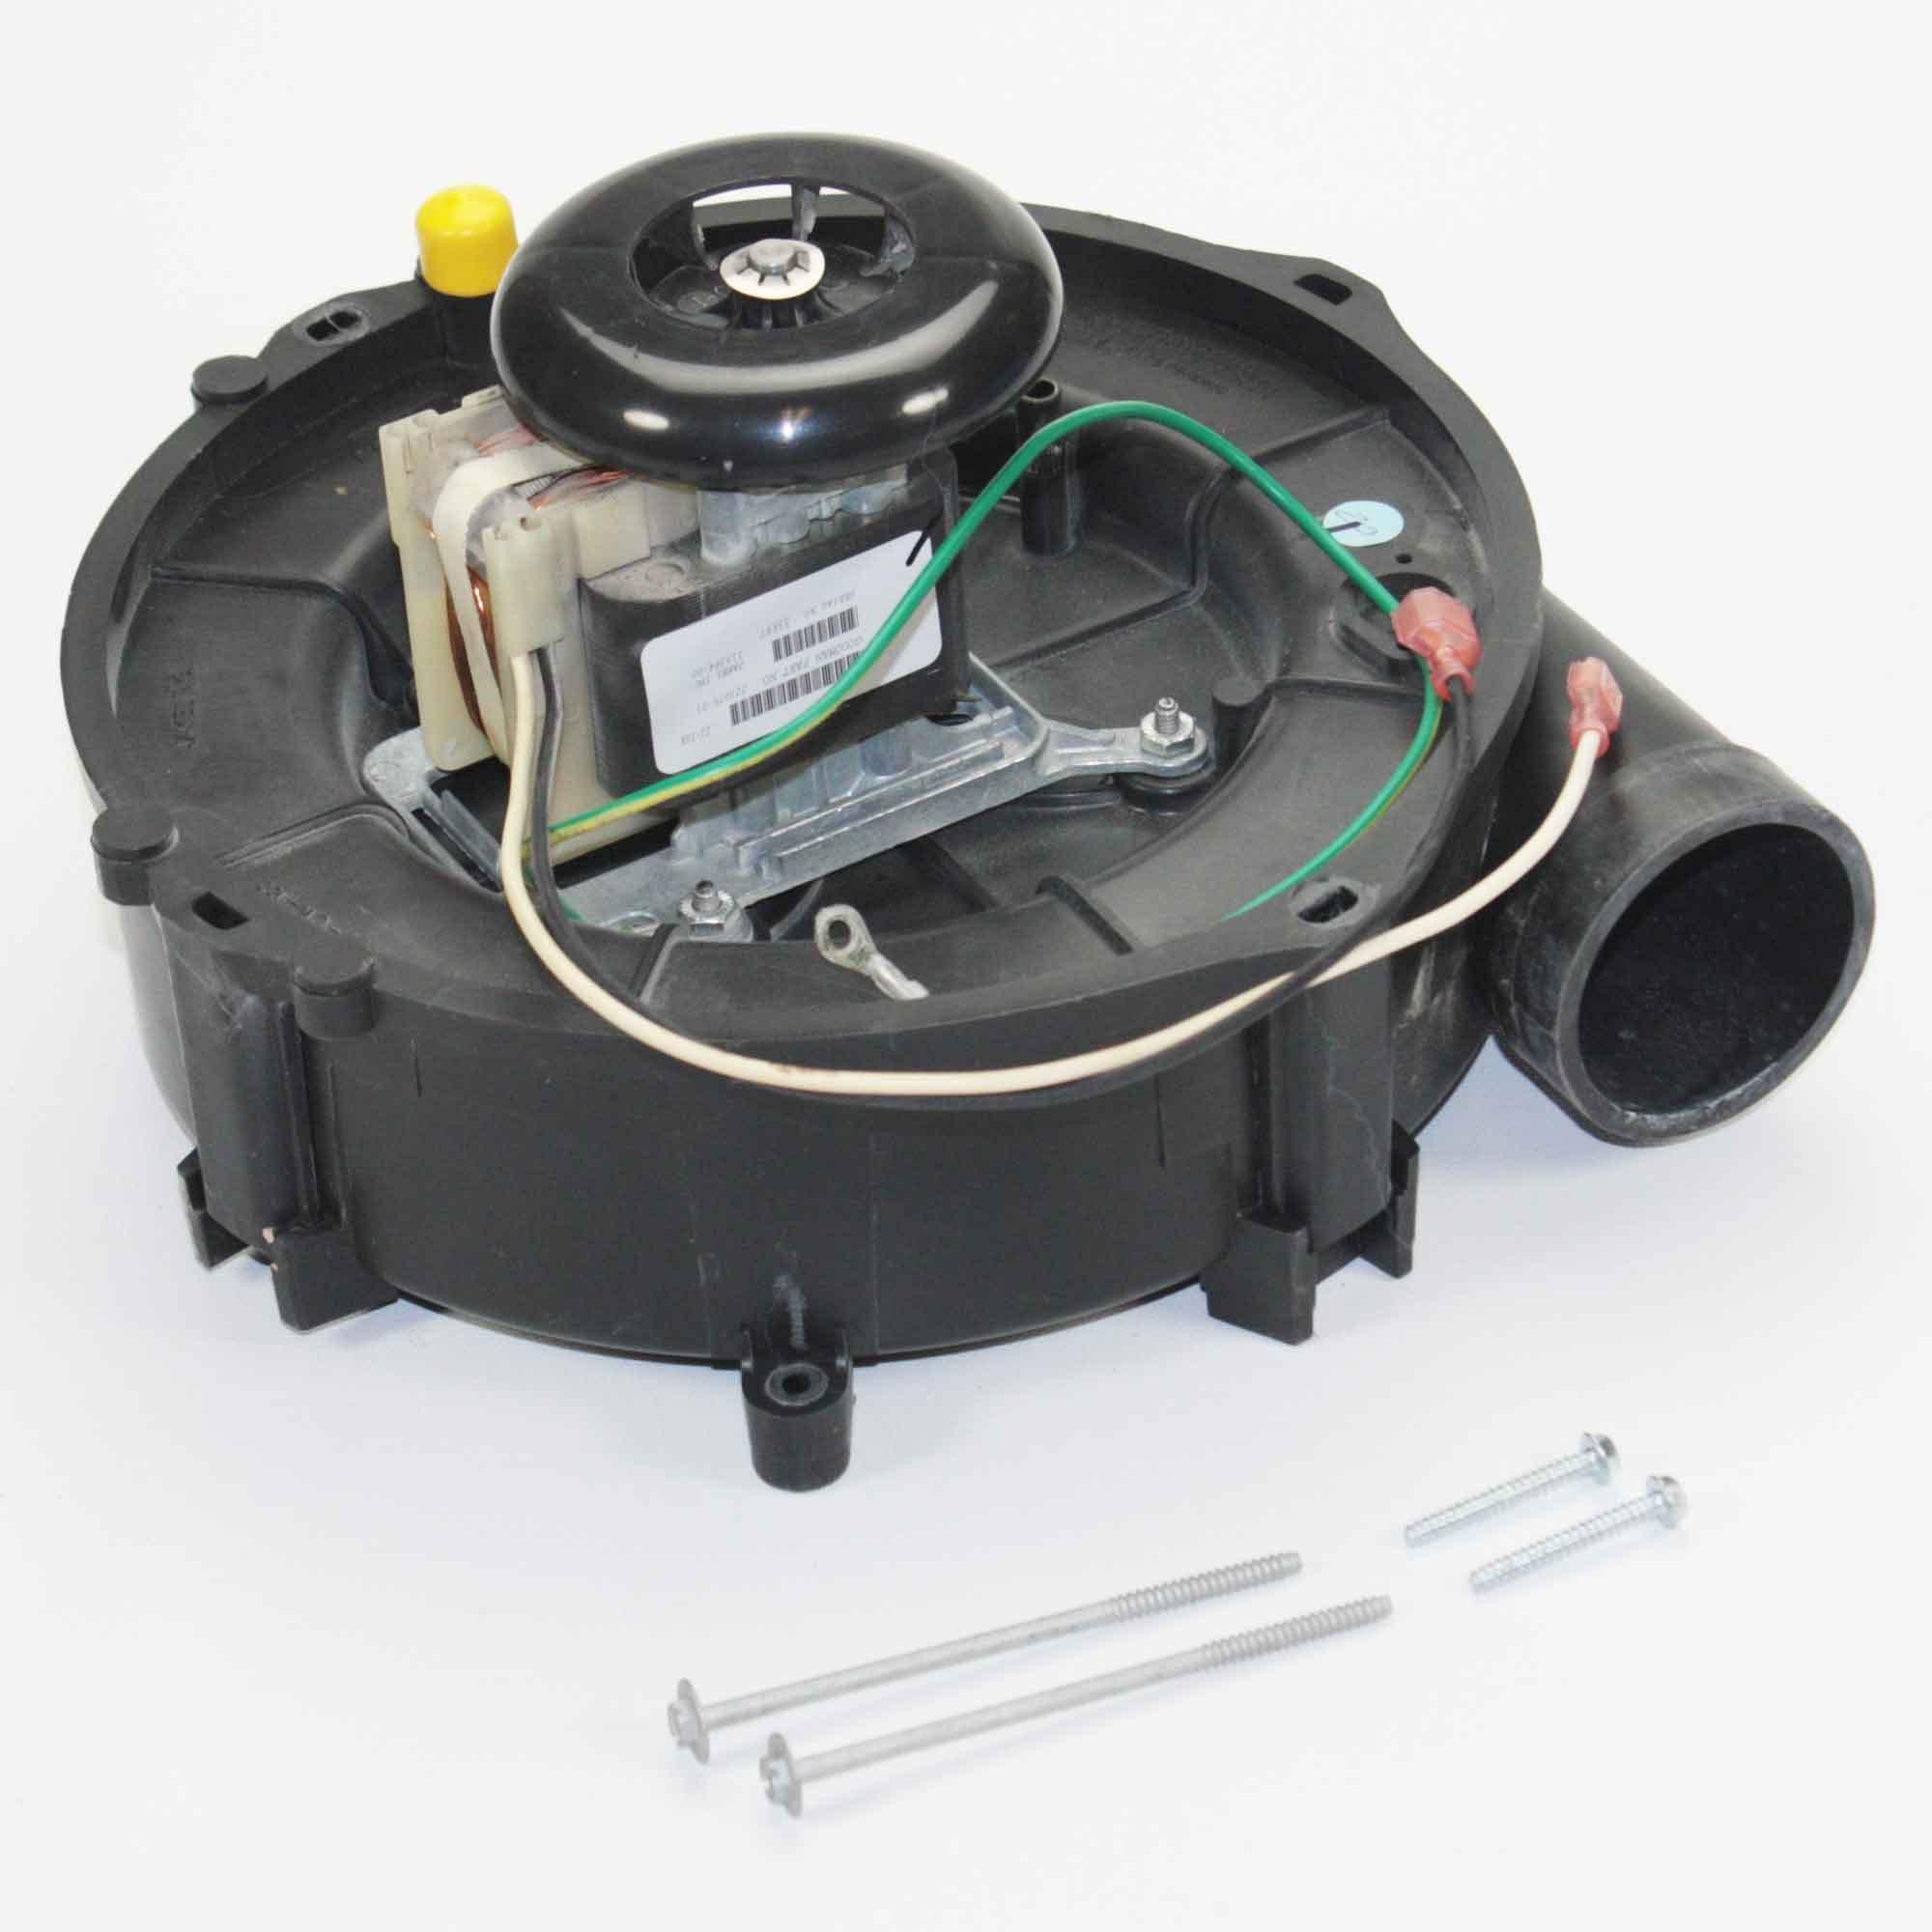 hight resolution of get quotations 0171m00001s genuine oem goodman furnace draft inducer blower motor